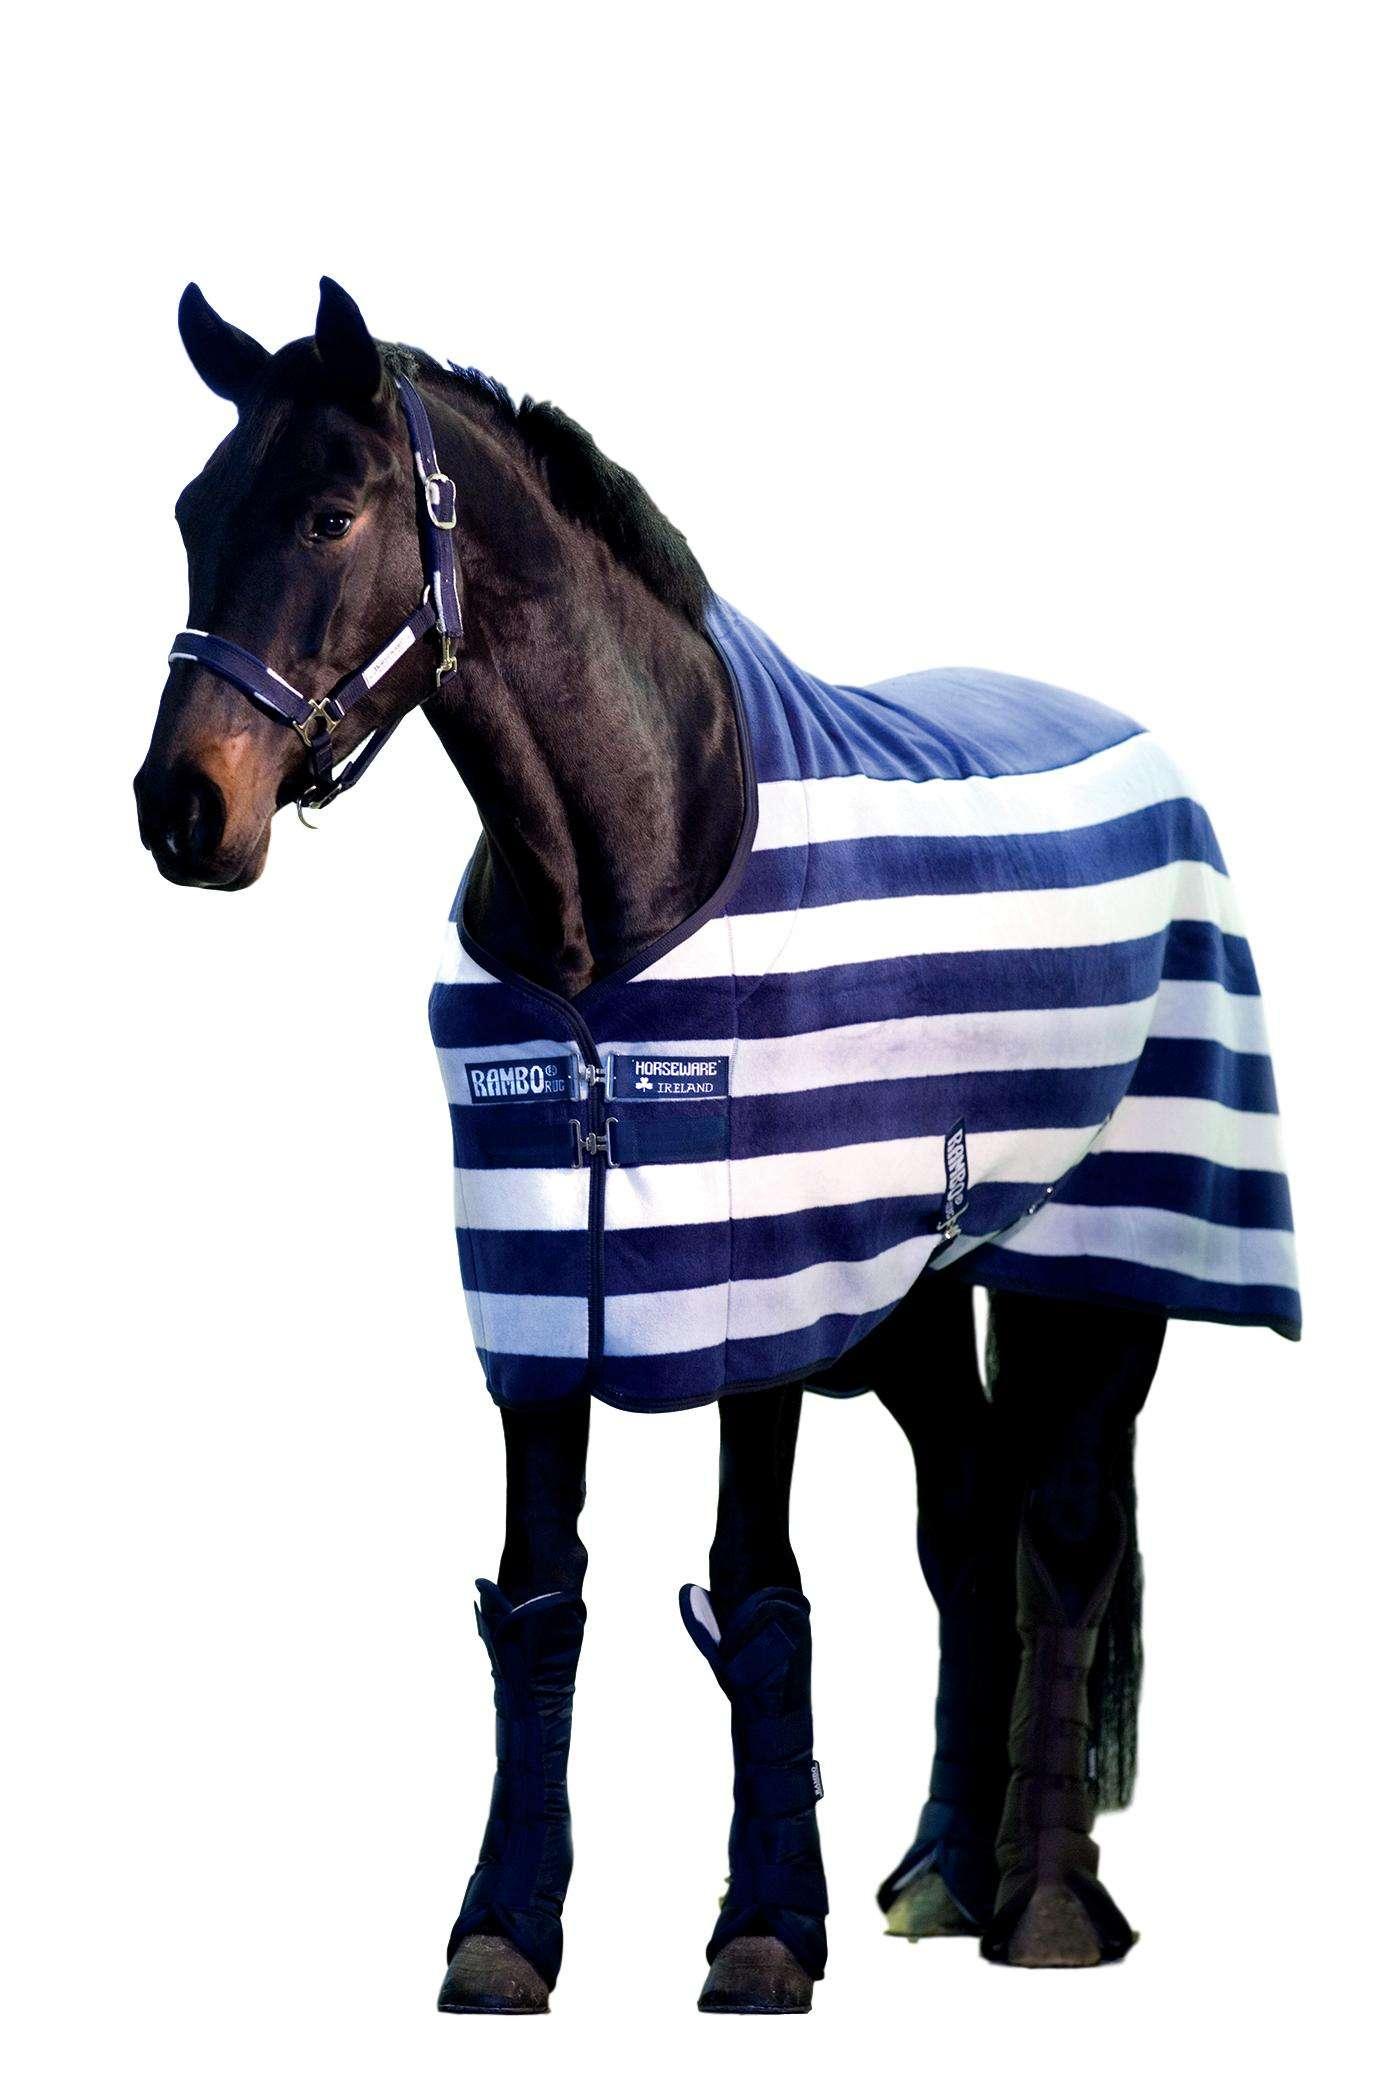 1c027457d8 Horseware Ireland Rambo Deluxe Fleece Stable Sheet Double Bonded ...